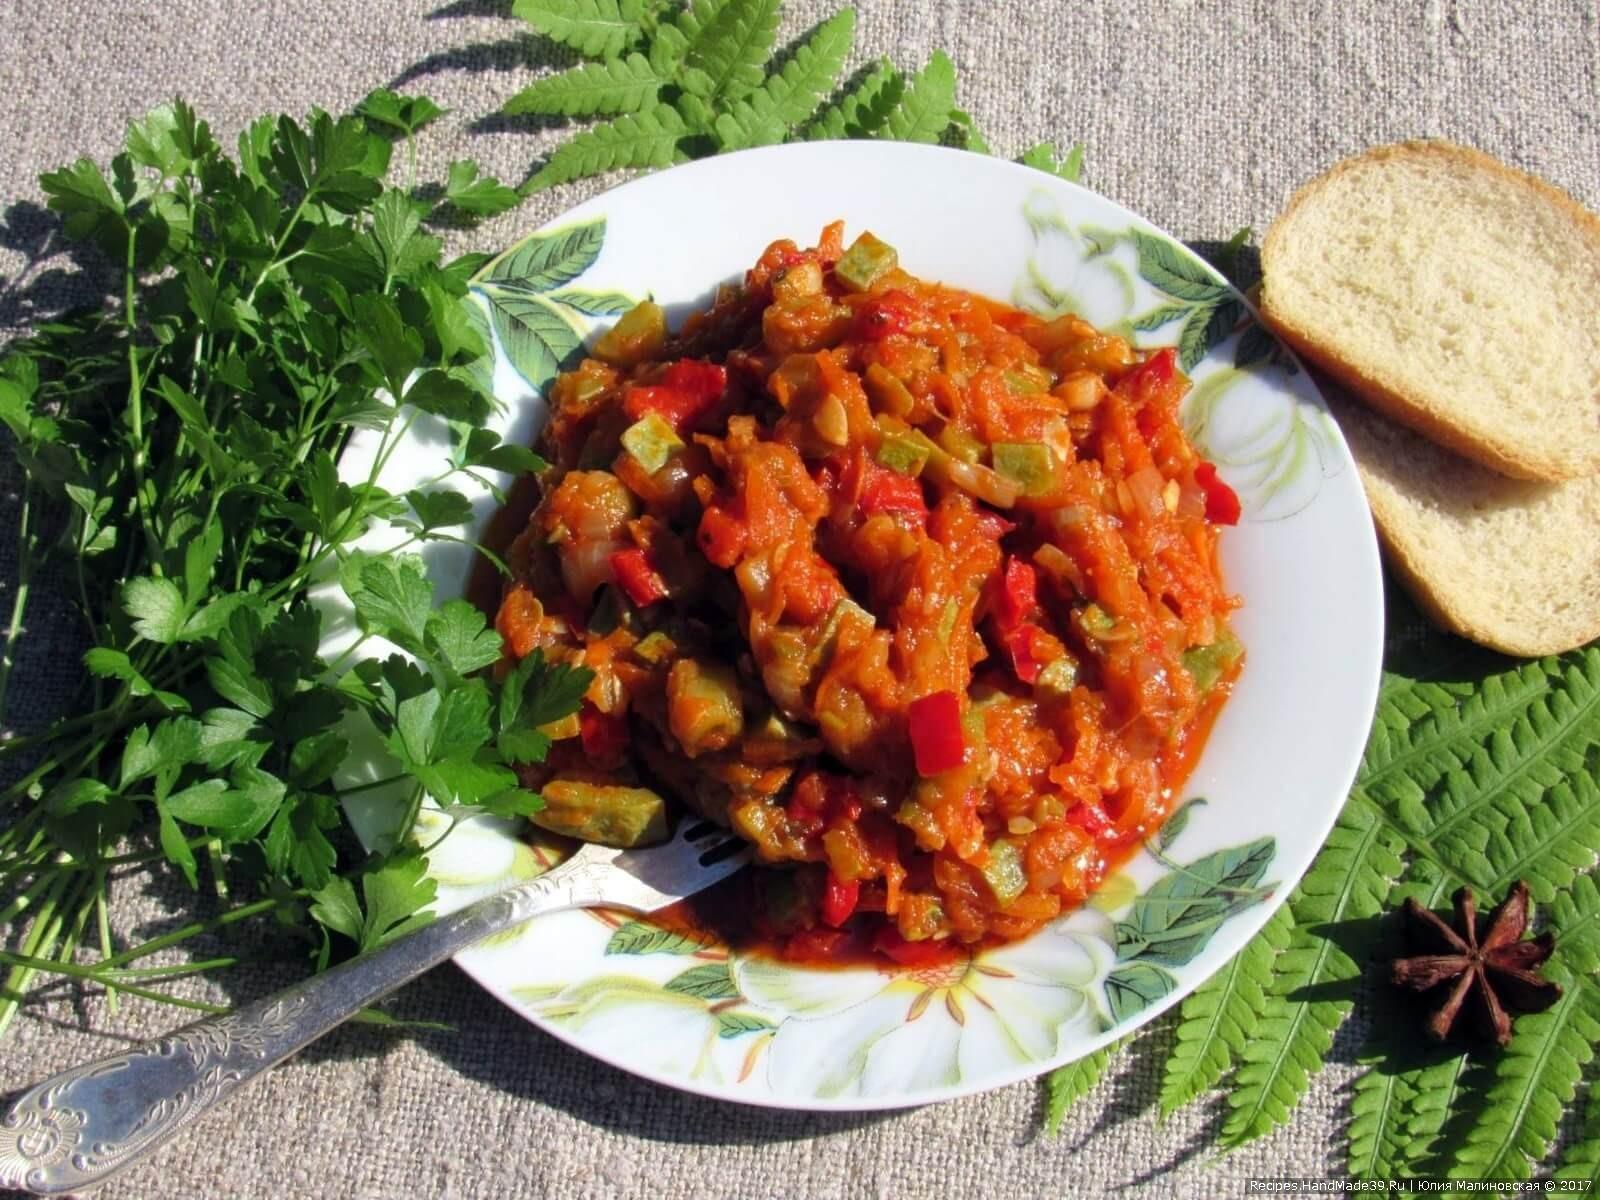 Добавить мелкопорезанную петрушку, и соте из кабачков готово: приятного аппетита!